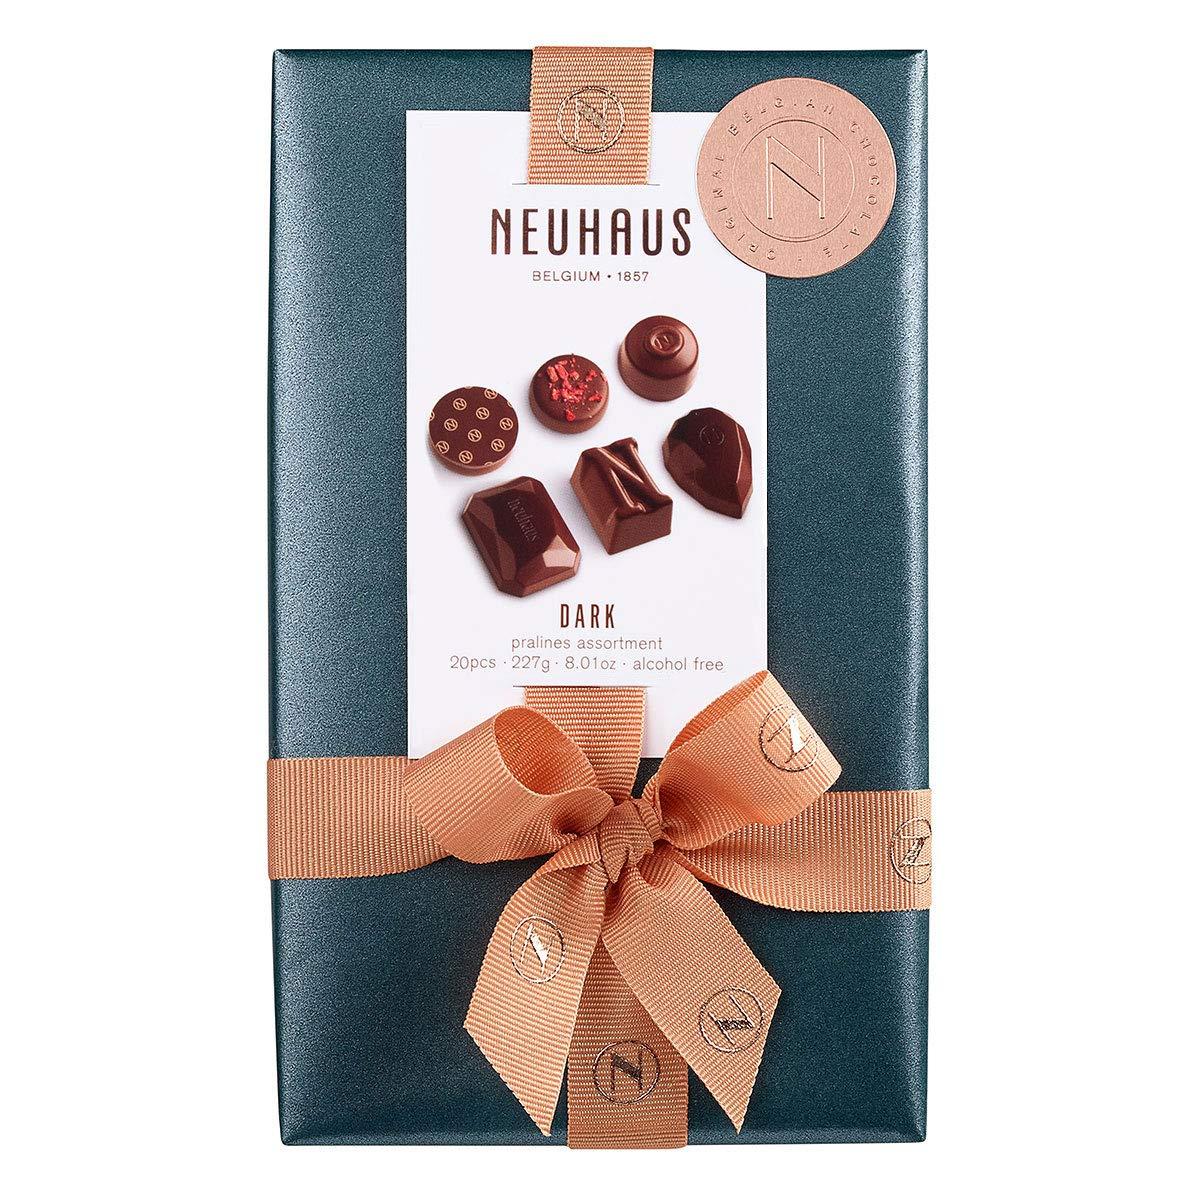 Neuhaus Belgian Dark Chocolate Pralines Assortment Ballotin 1/2 lb , Premium Chocolate Gift Ballotin Box , Gourmet Dark Chocolate Assortment, 20 count